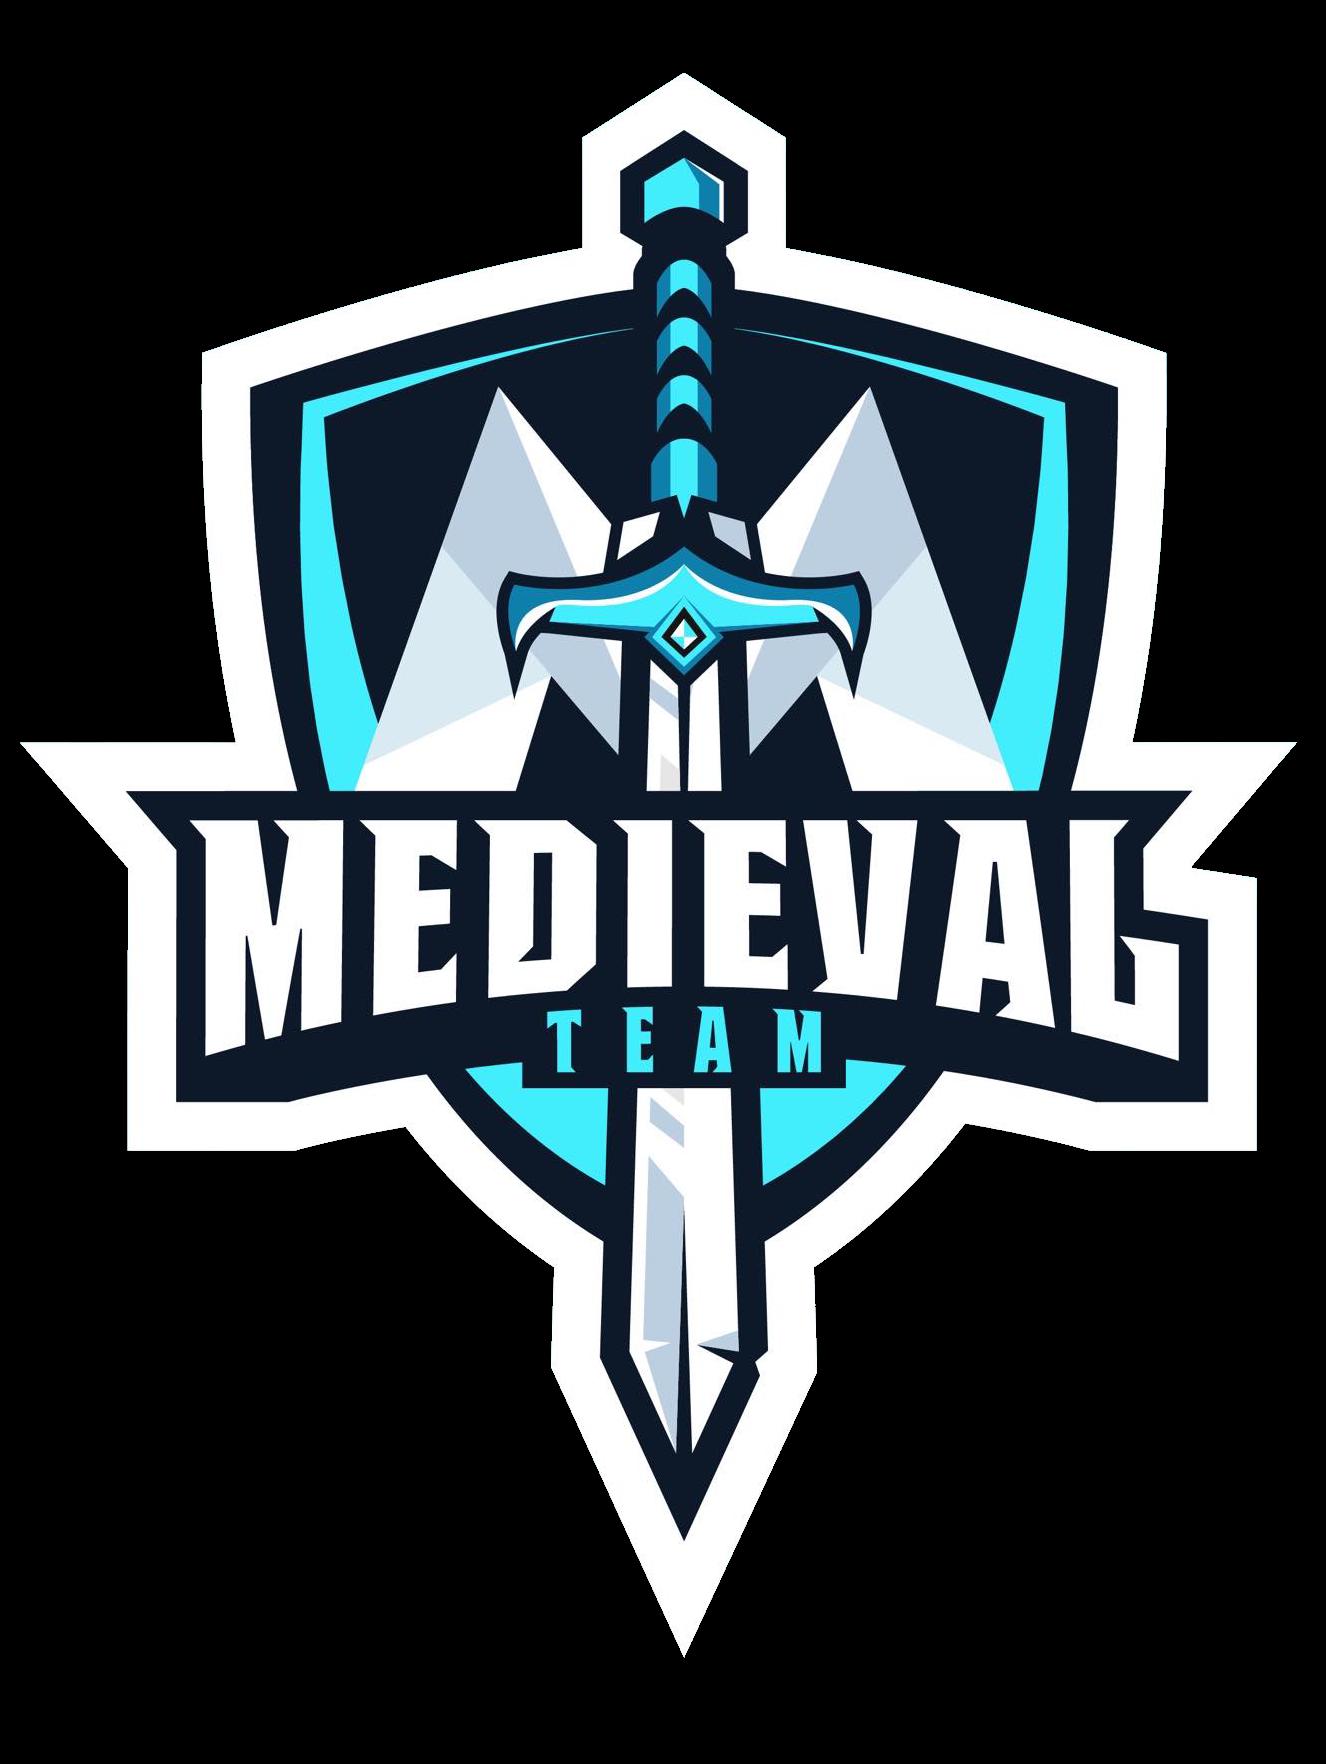 Team Medieval